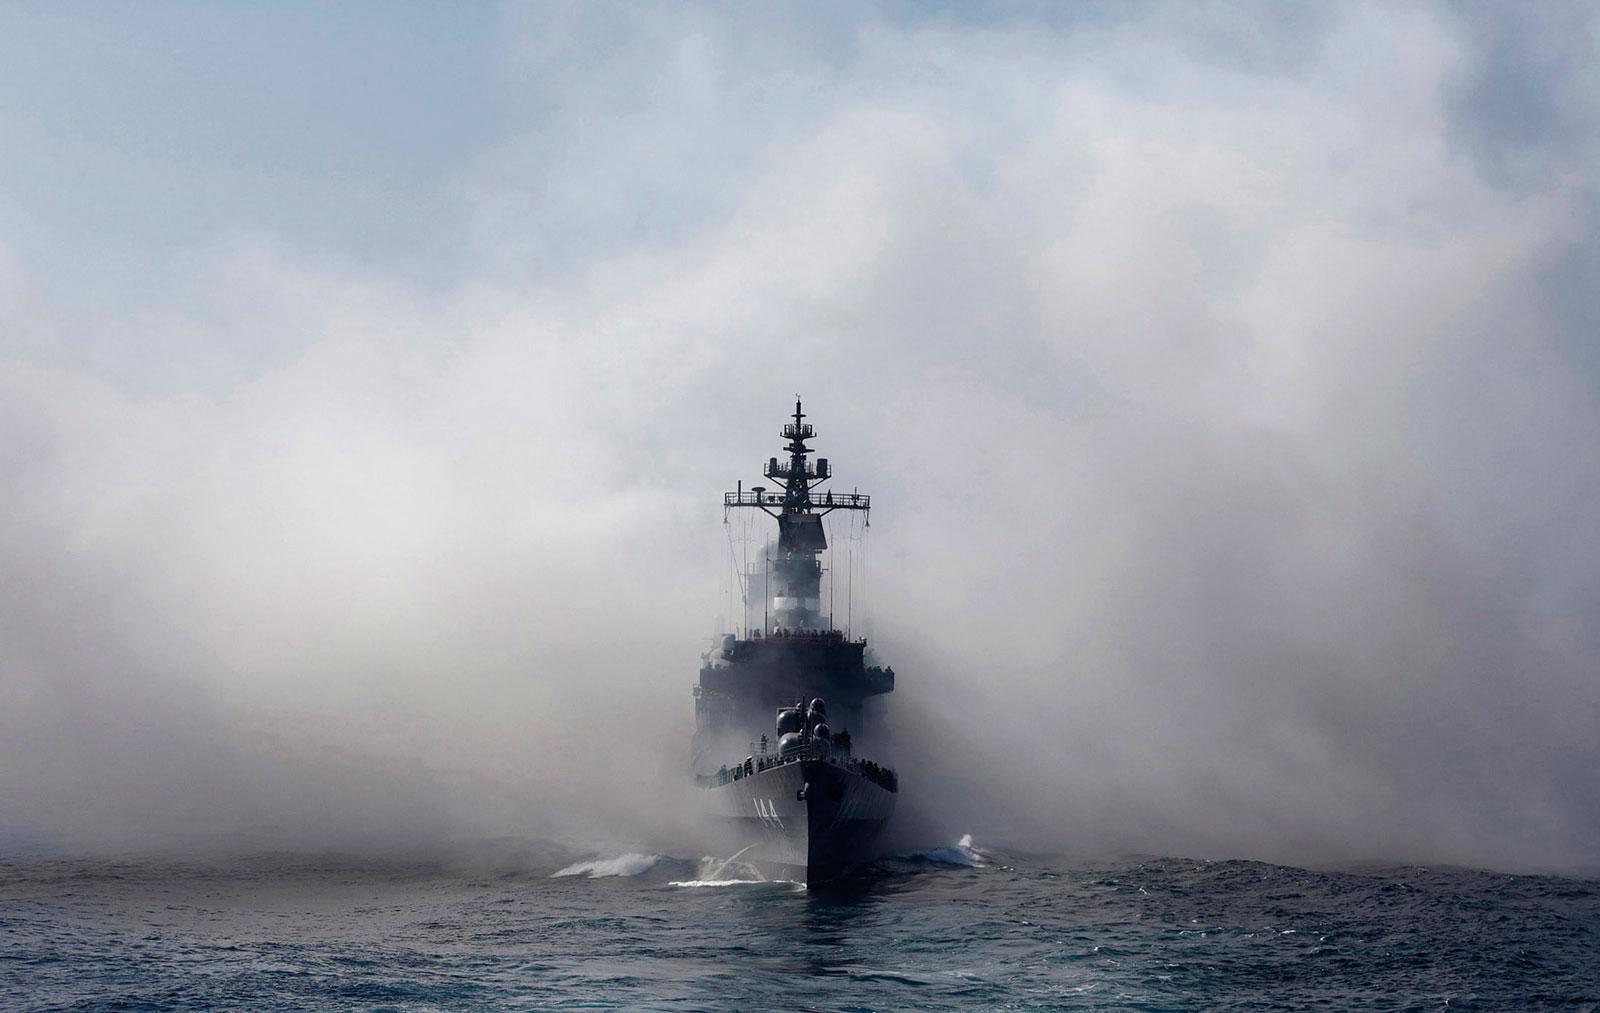 Japan Maritime Self-Defense Force destroyer ship Kurama sails as it exits the smoke of anti-IR missile flares during a review at Sagami Bay, off Yokosuka, Kanagawa Prefecture, Japan